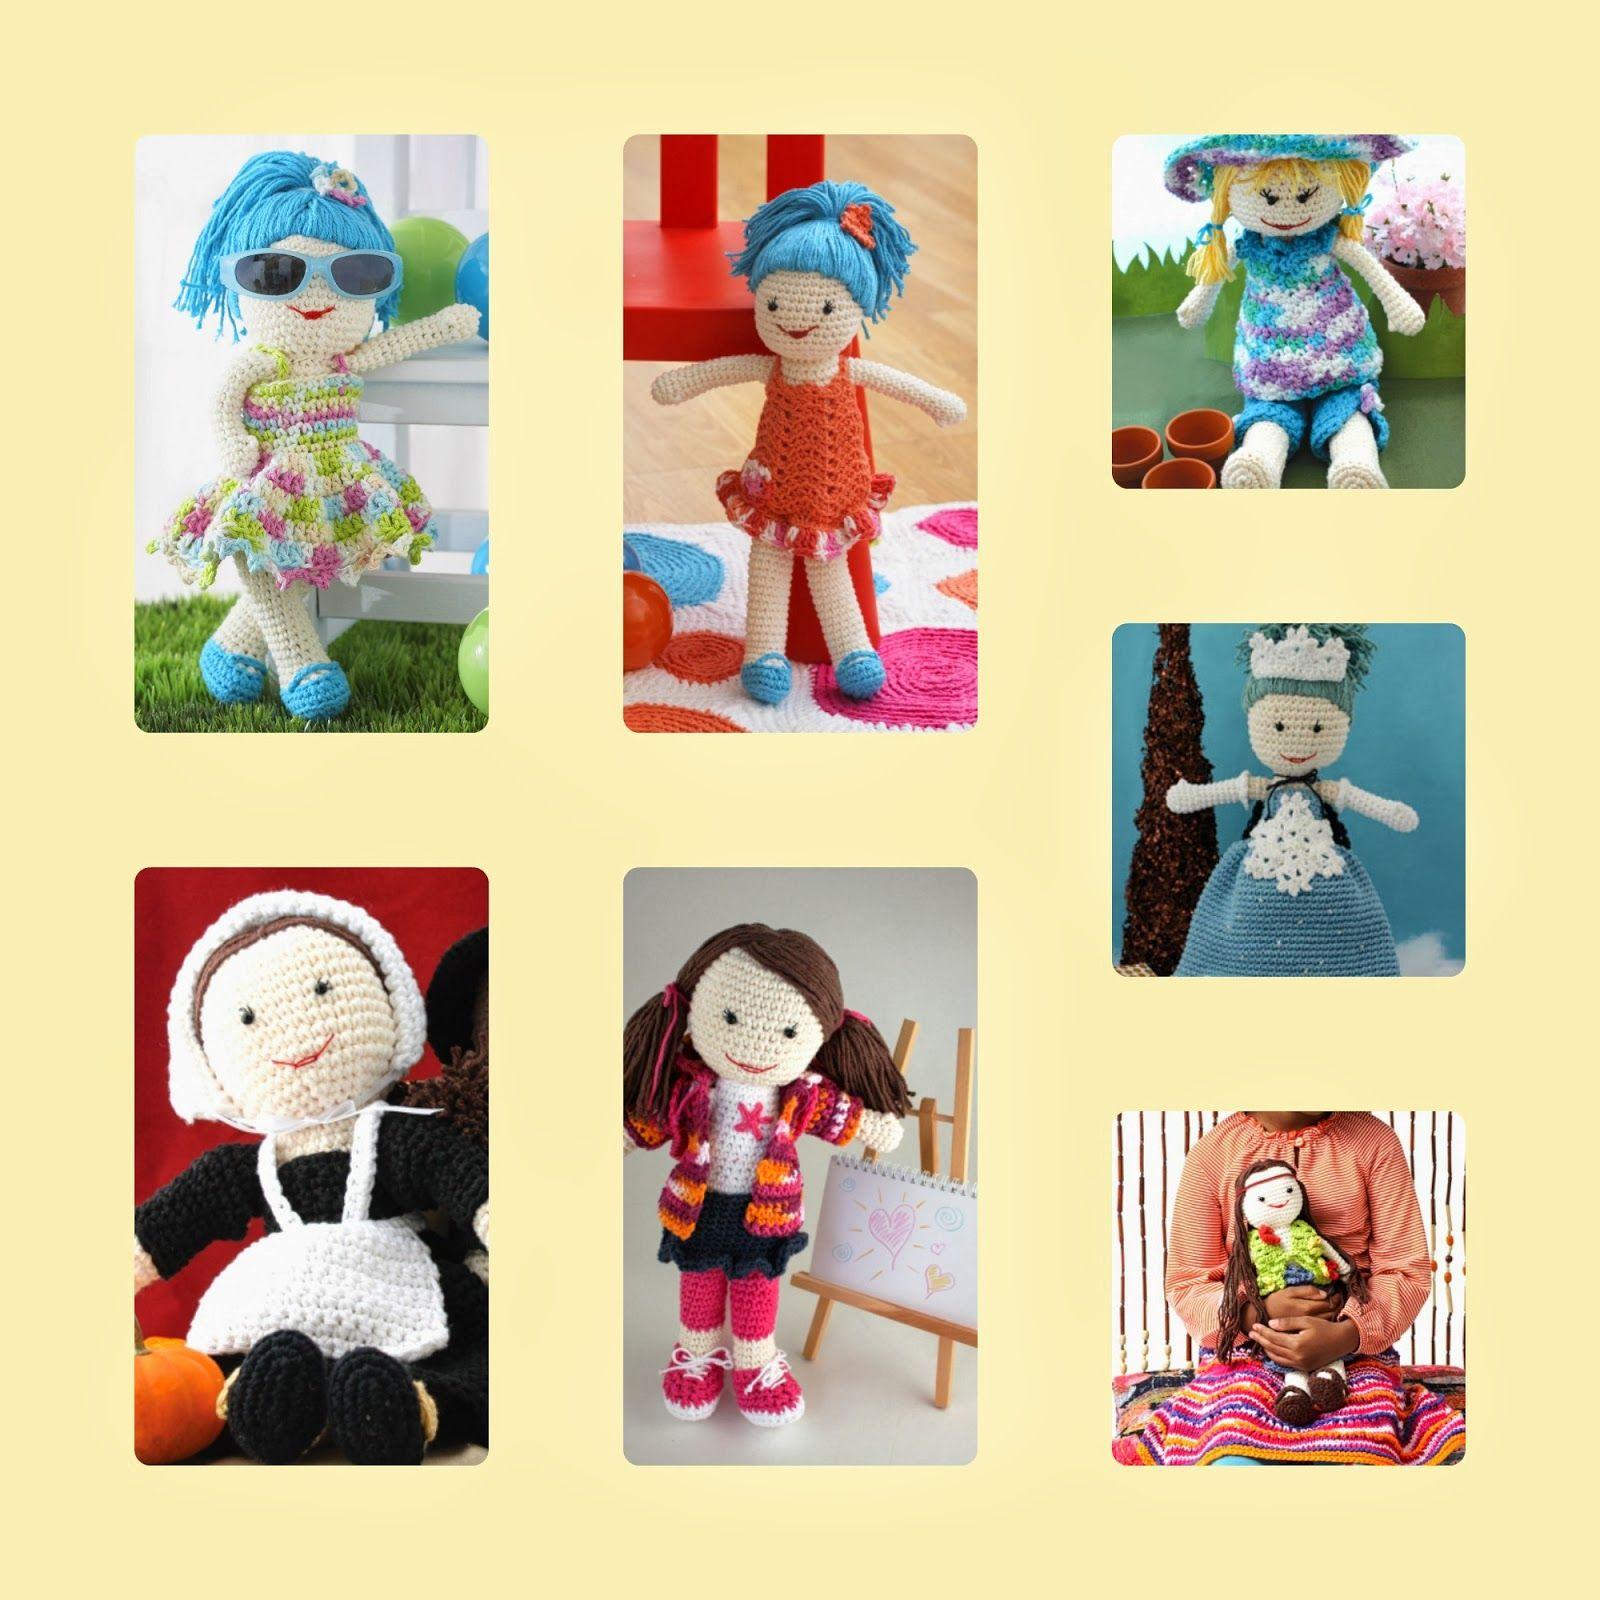 crochet doll-crochet doll patterns-easy crochet doll patterns-free ...